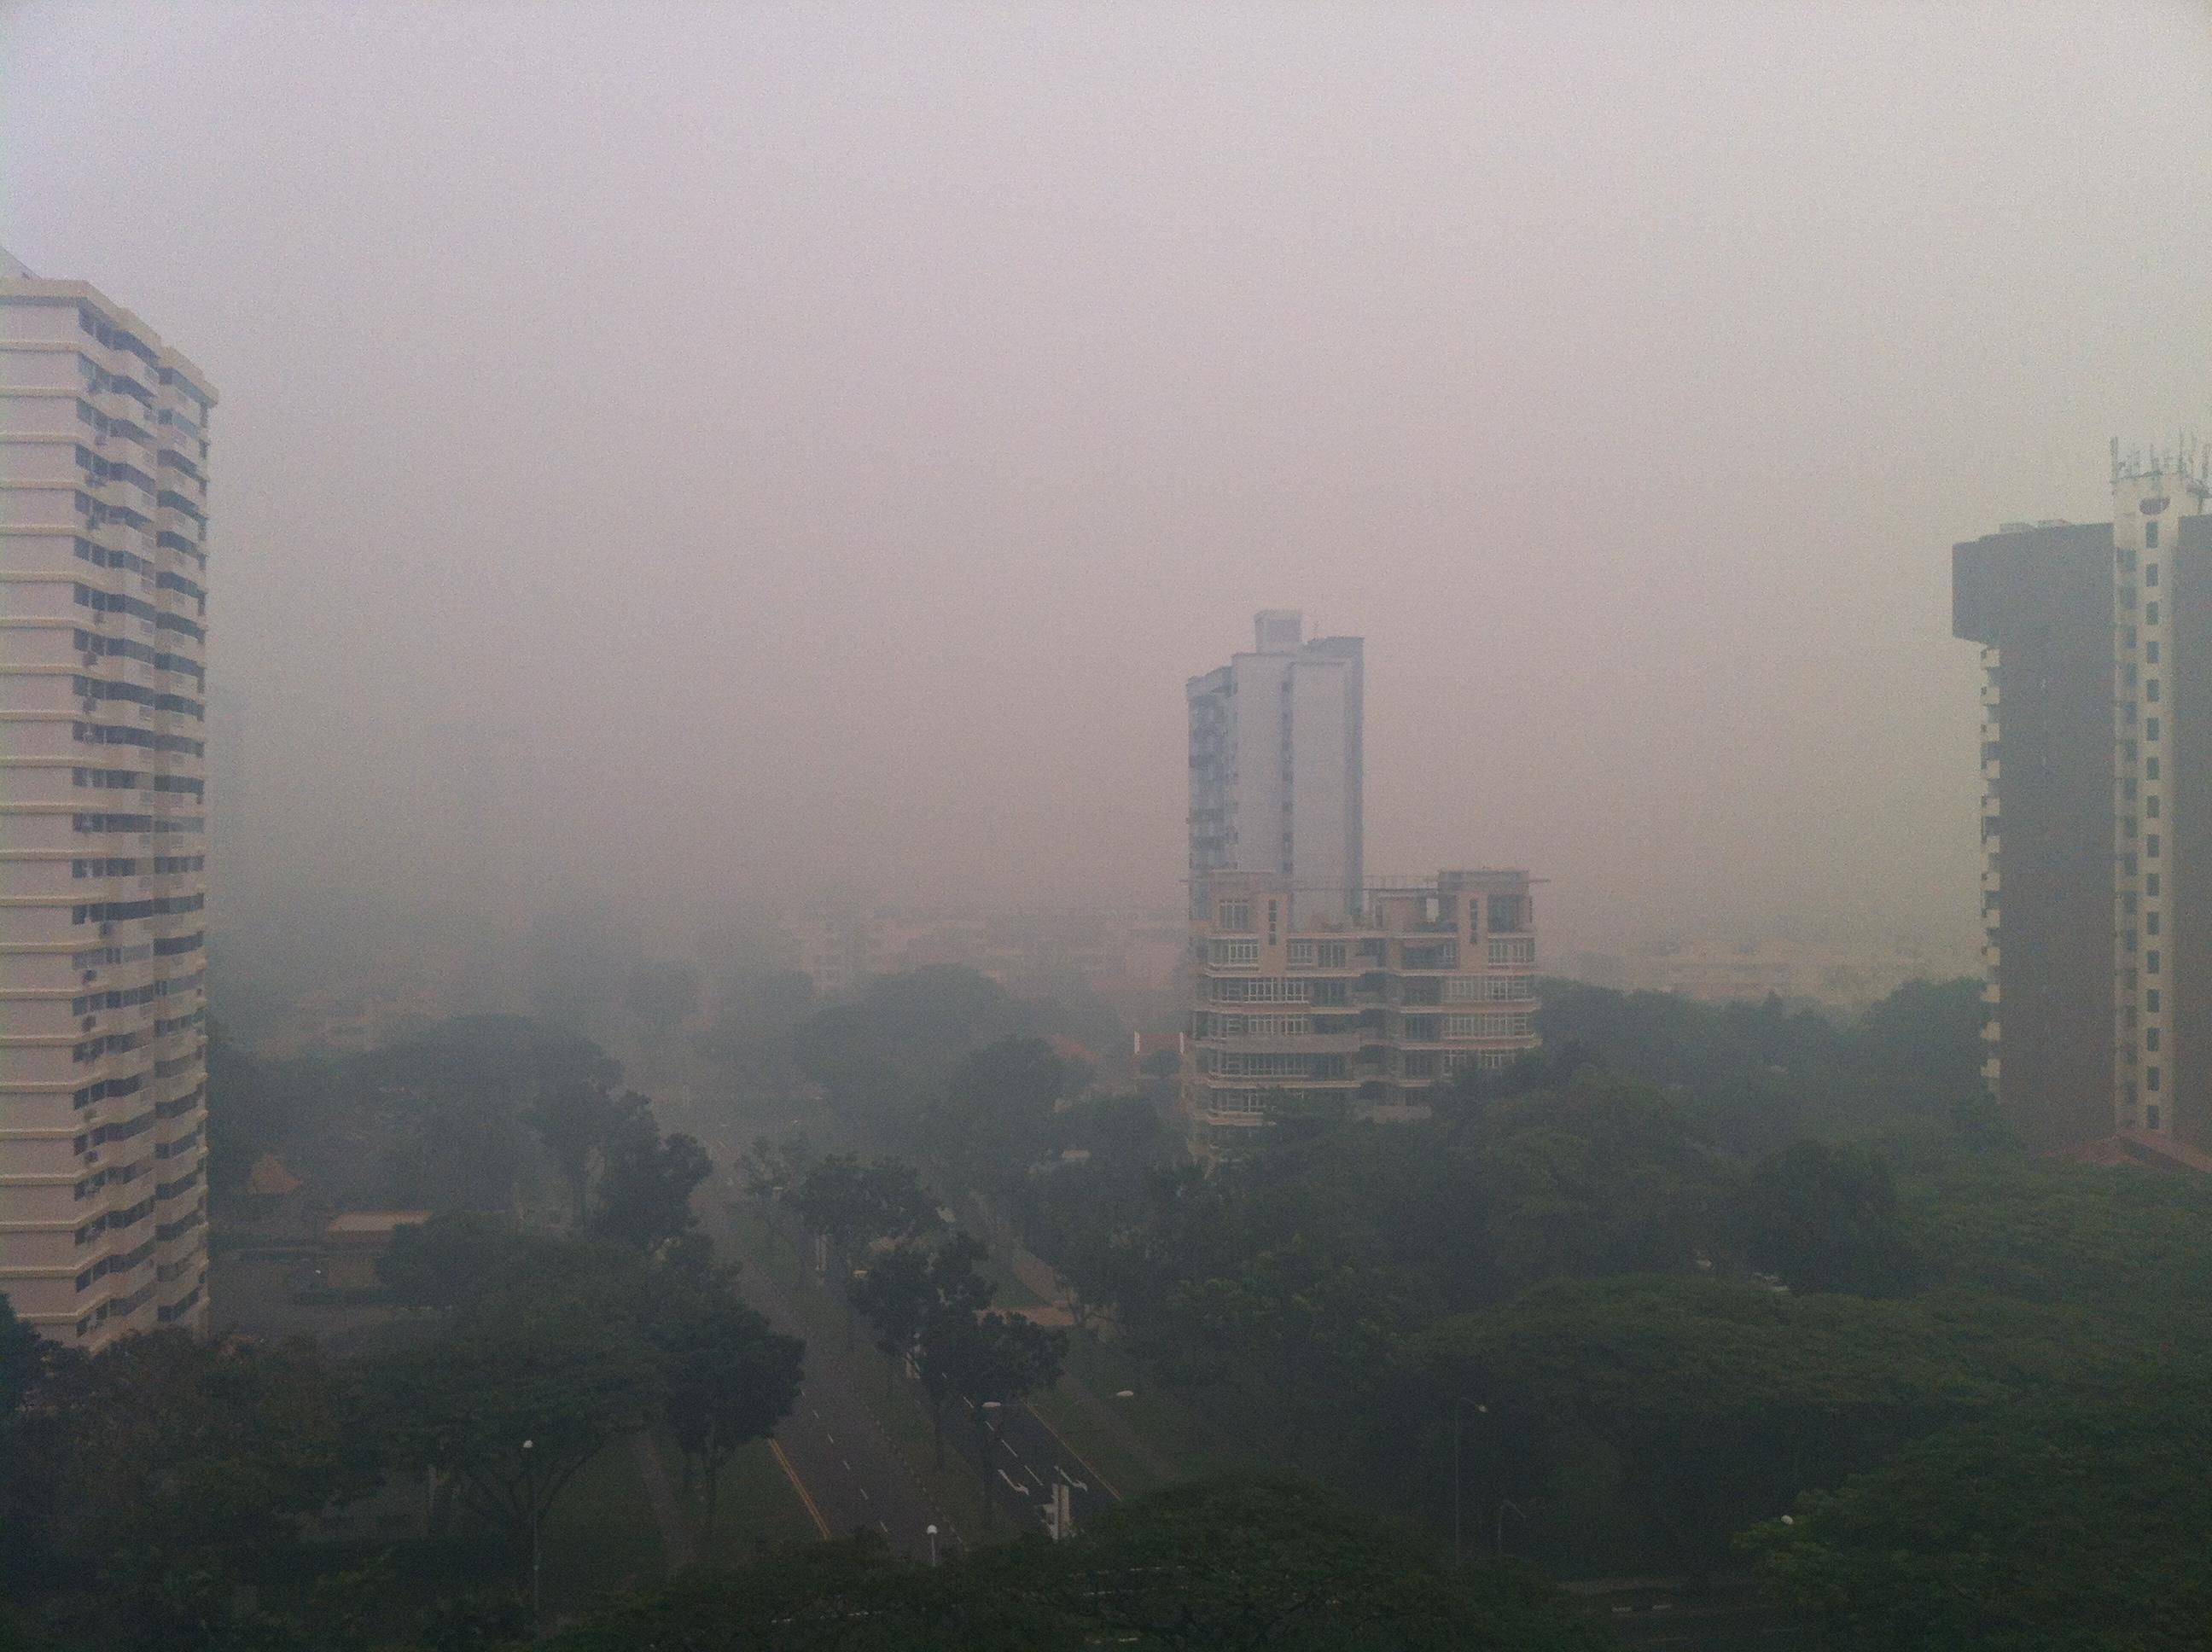 Amazing Haze Pictures & Backgrounds